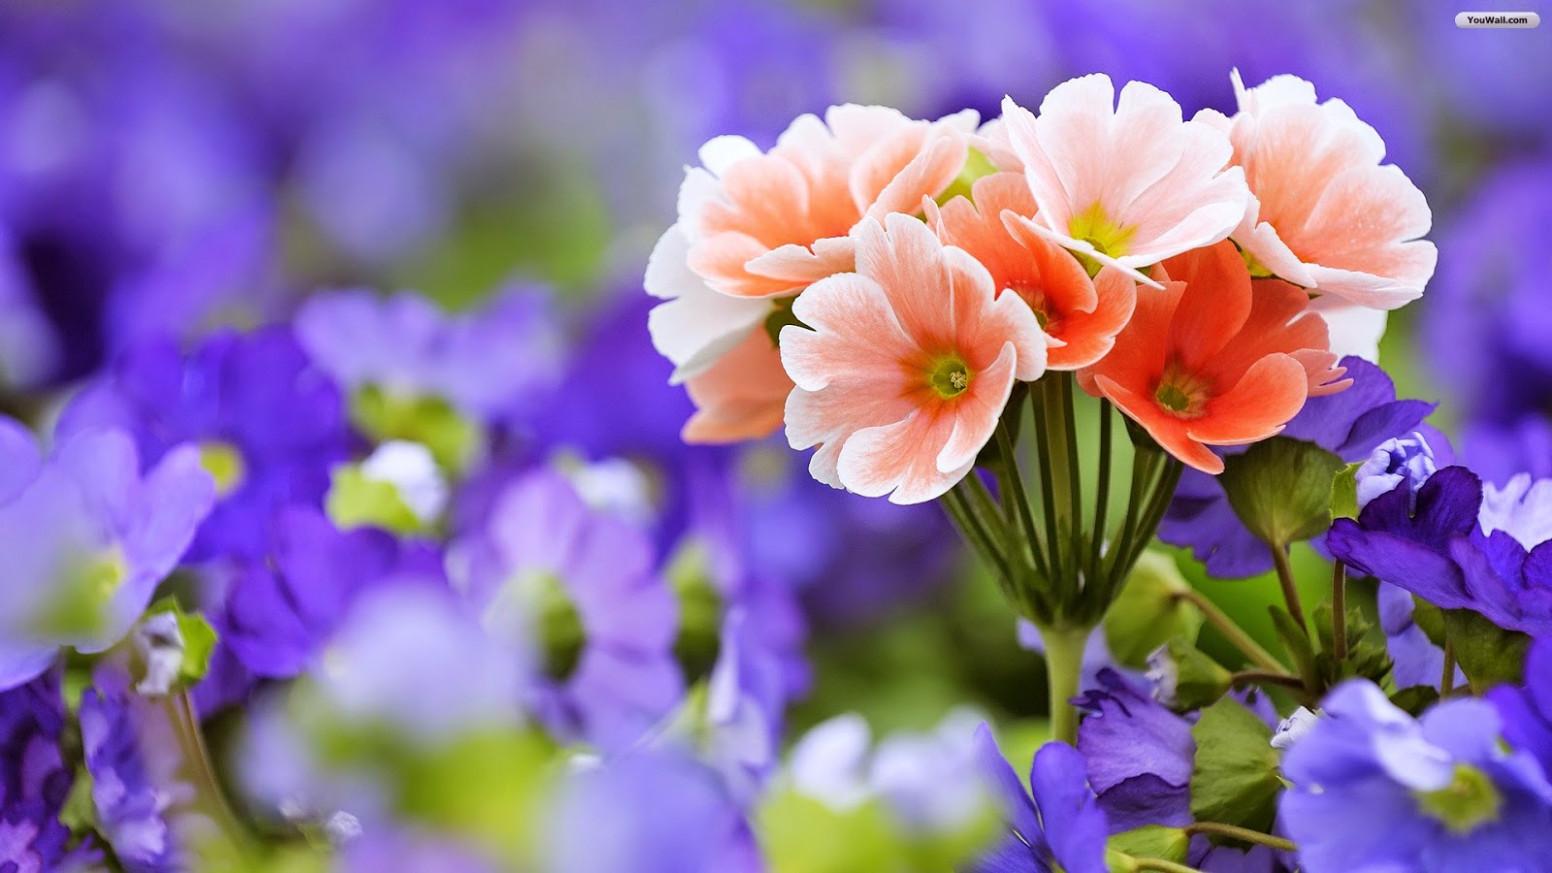 World Beautiful Flowers Wallpaper Group 20 Beautiful - Windows 10 Wallpaper Flower Hd , HD Wallpaper & Backgrounds